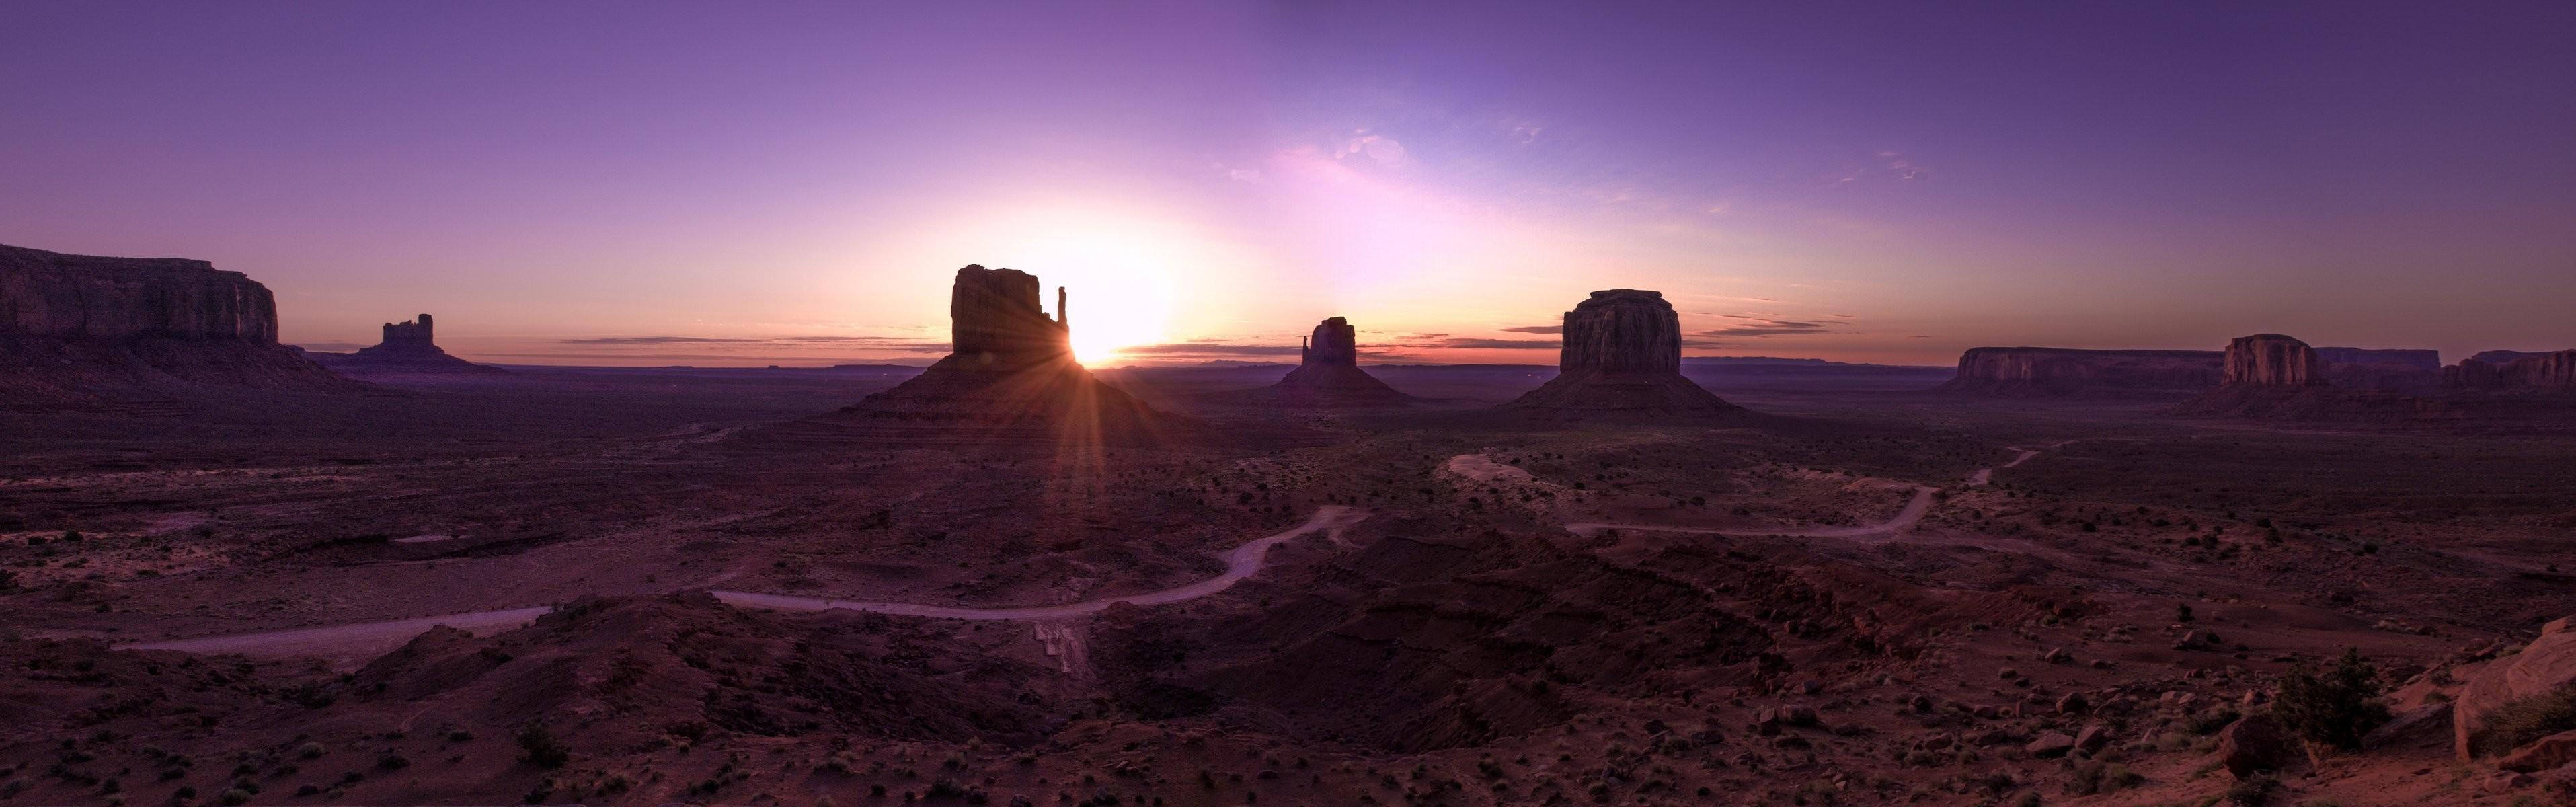 arizona monument valley landscape panorama desert valley mountain dawn